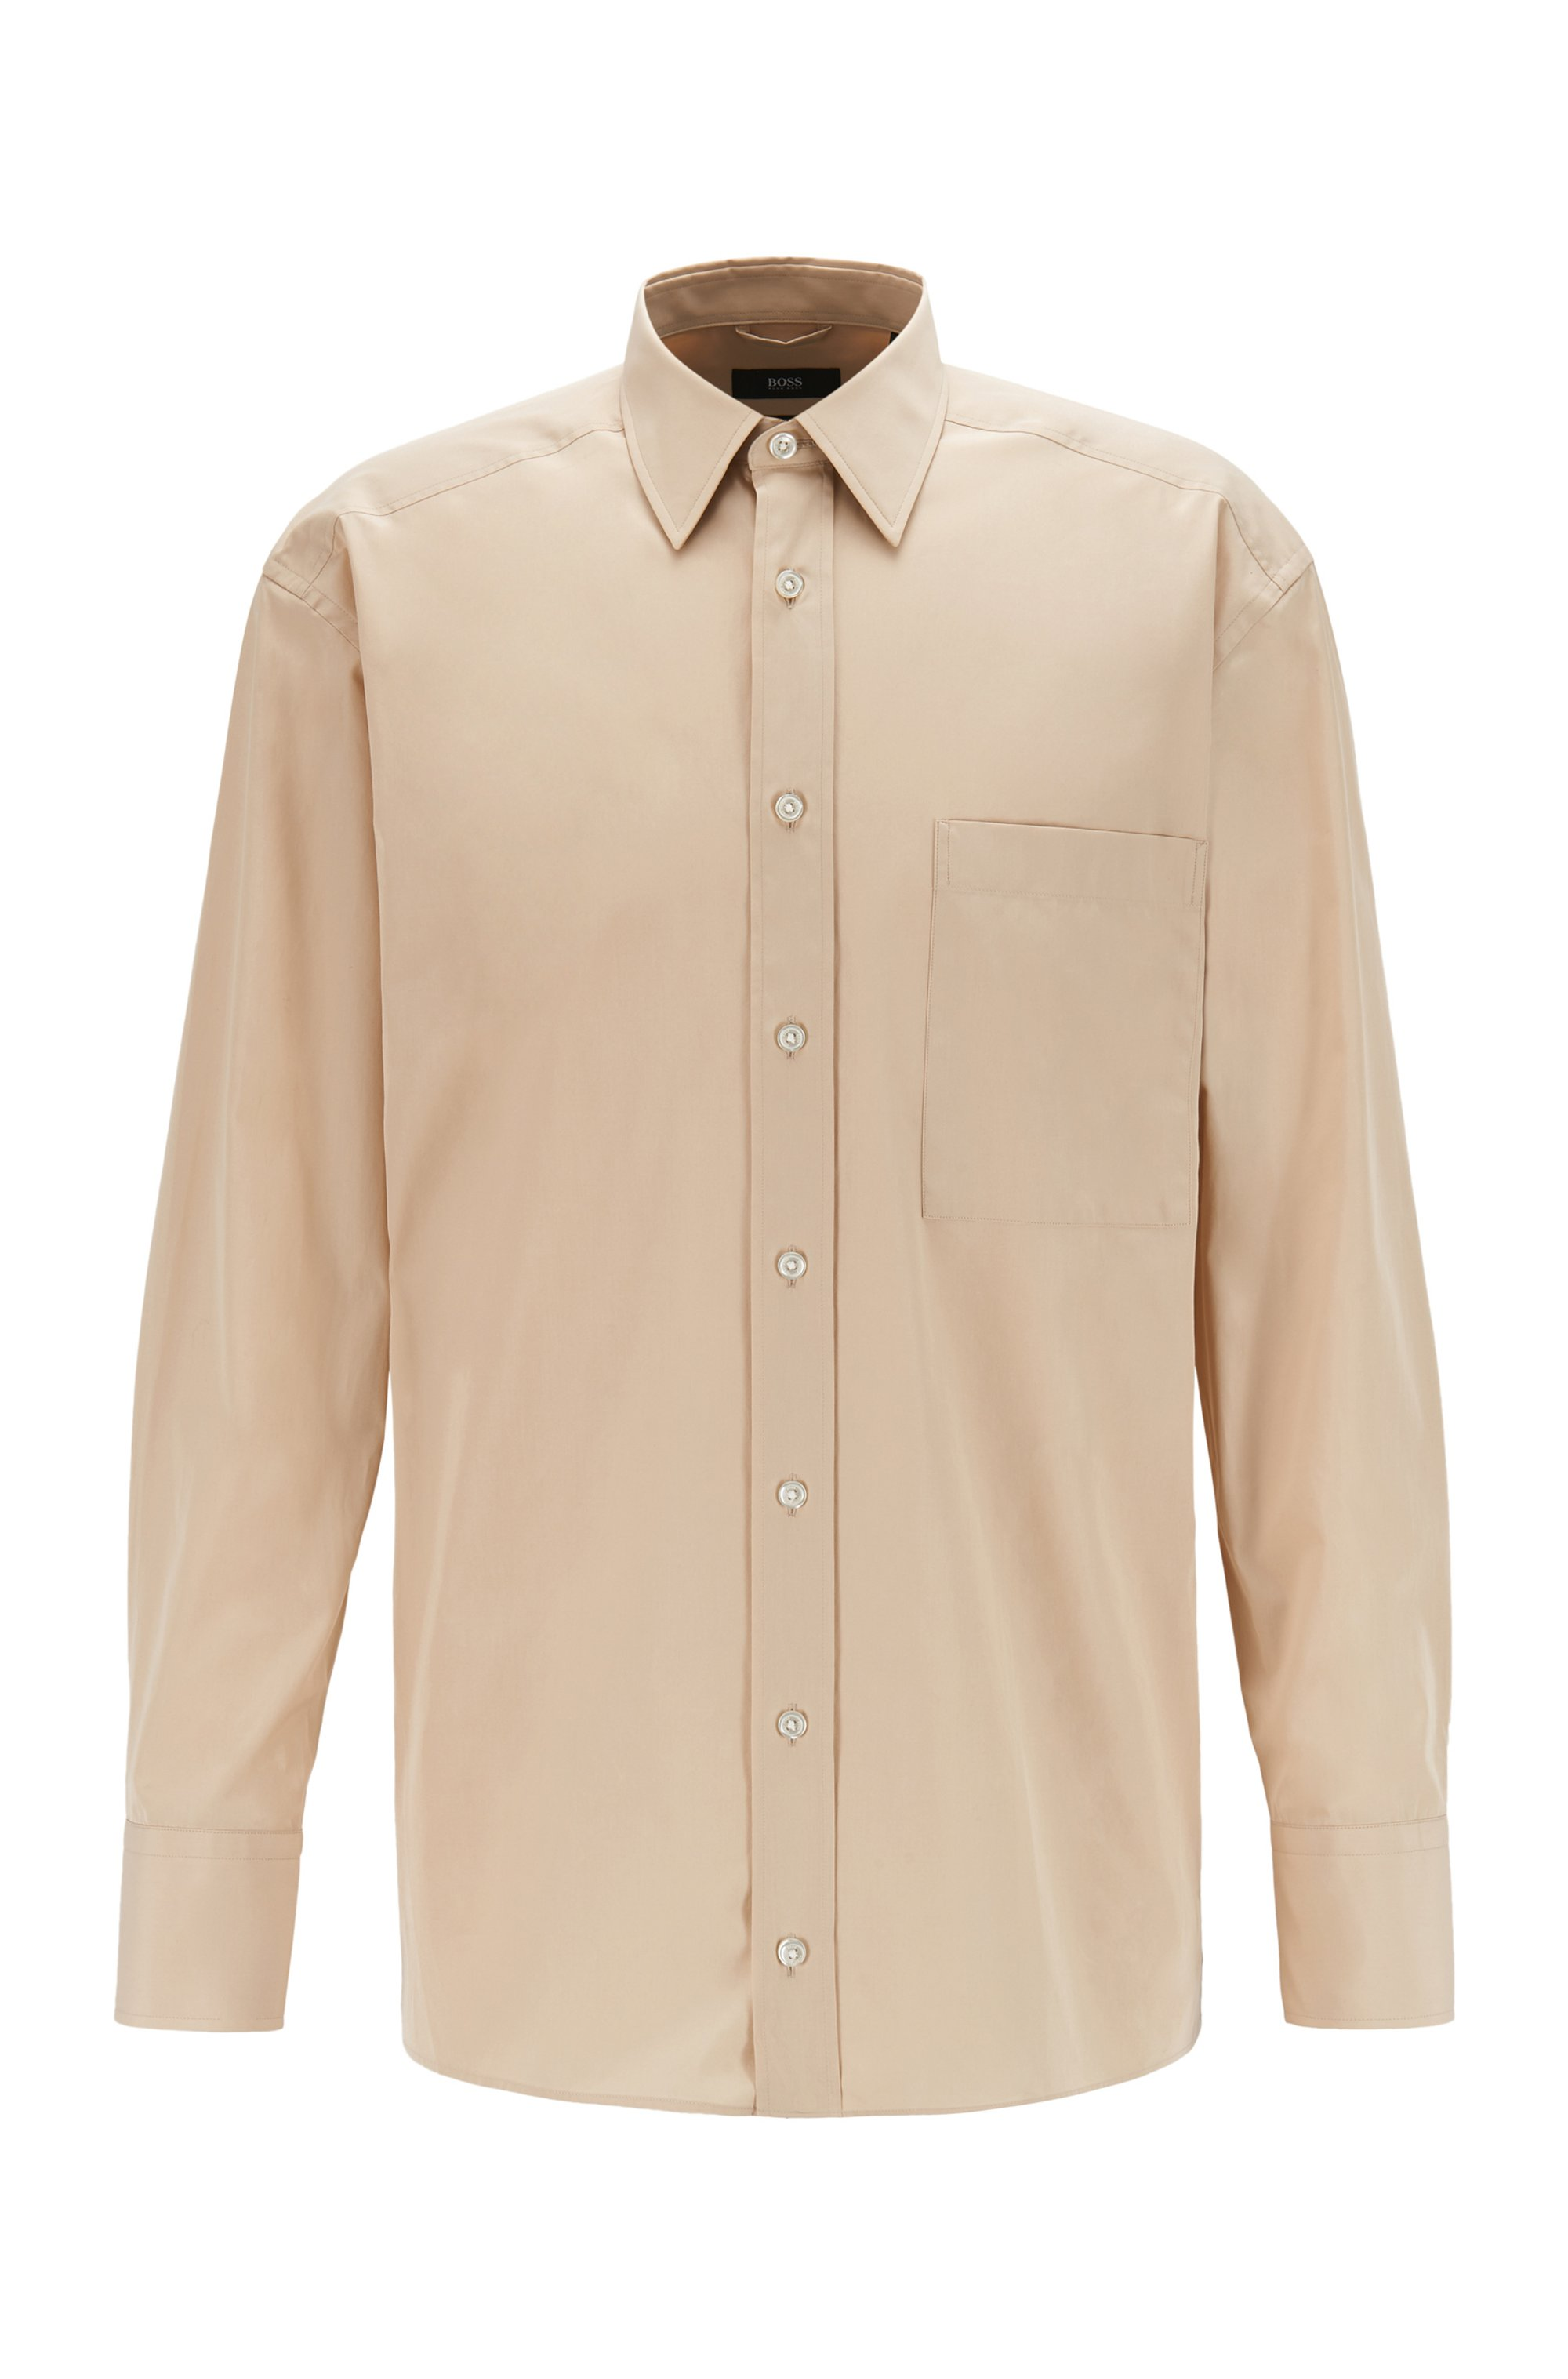 Camisa relaxed fit en popelín de algodón mate, Beige claro